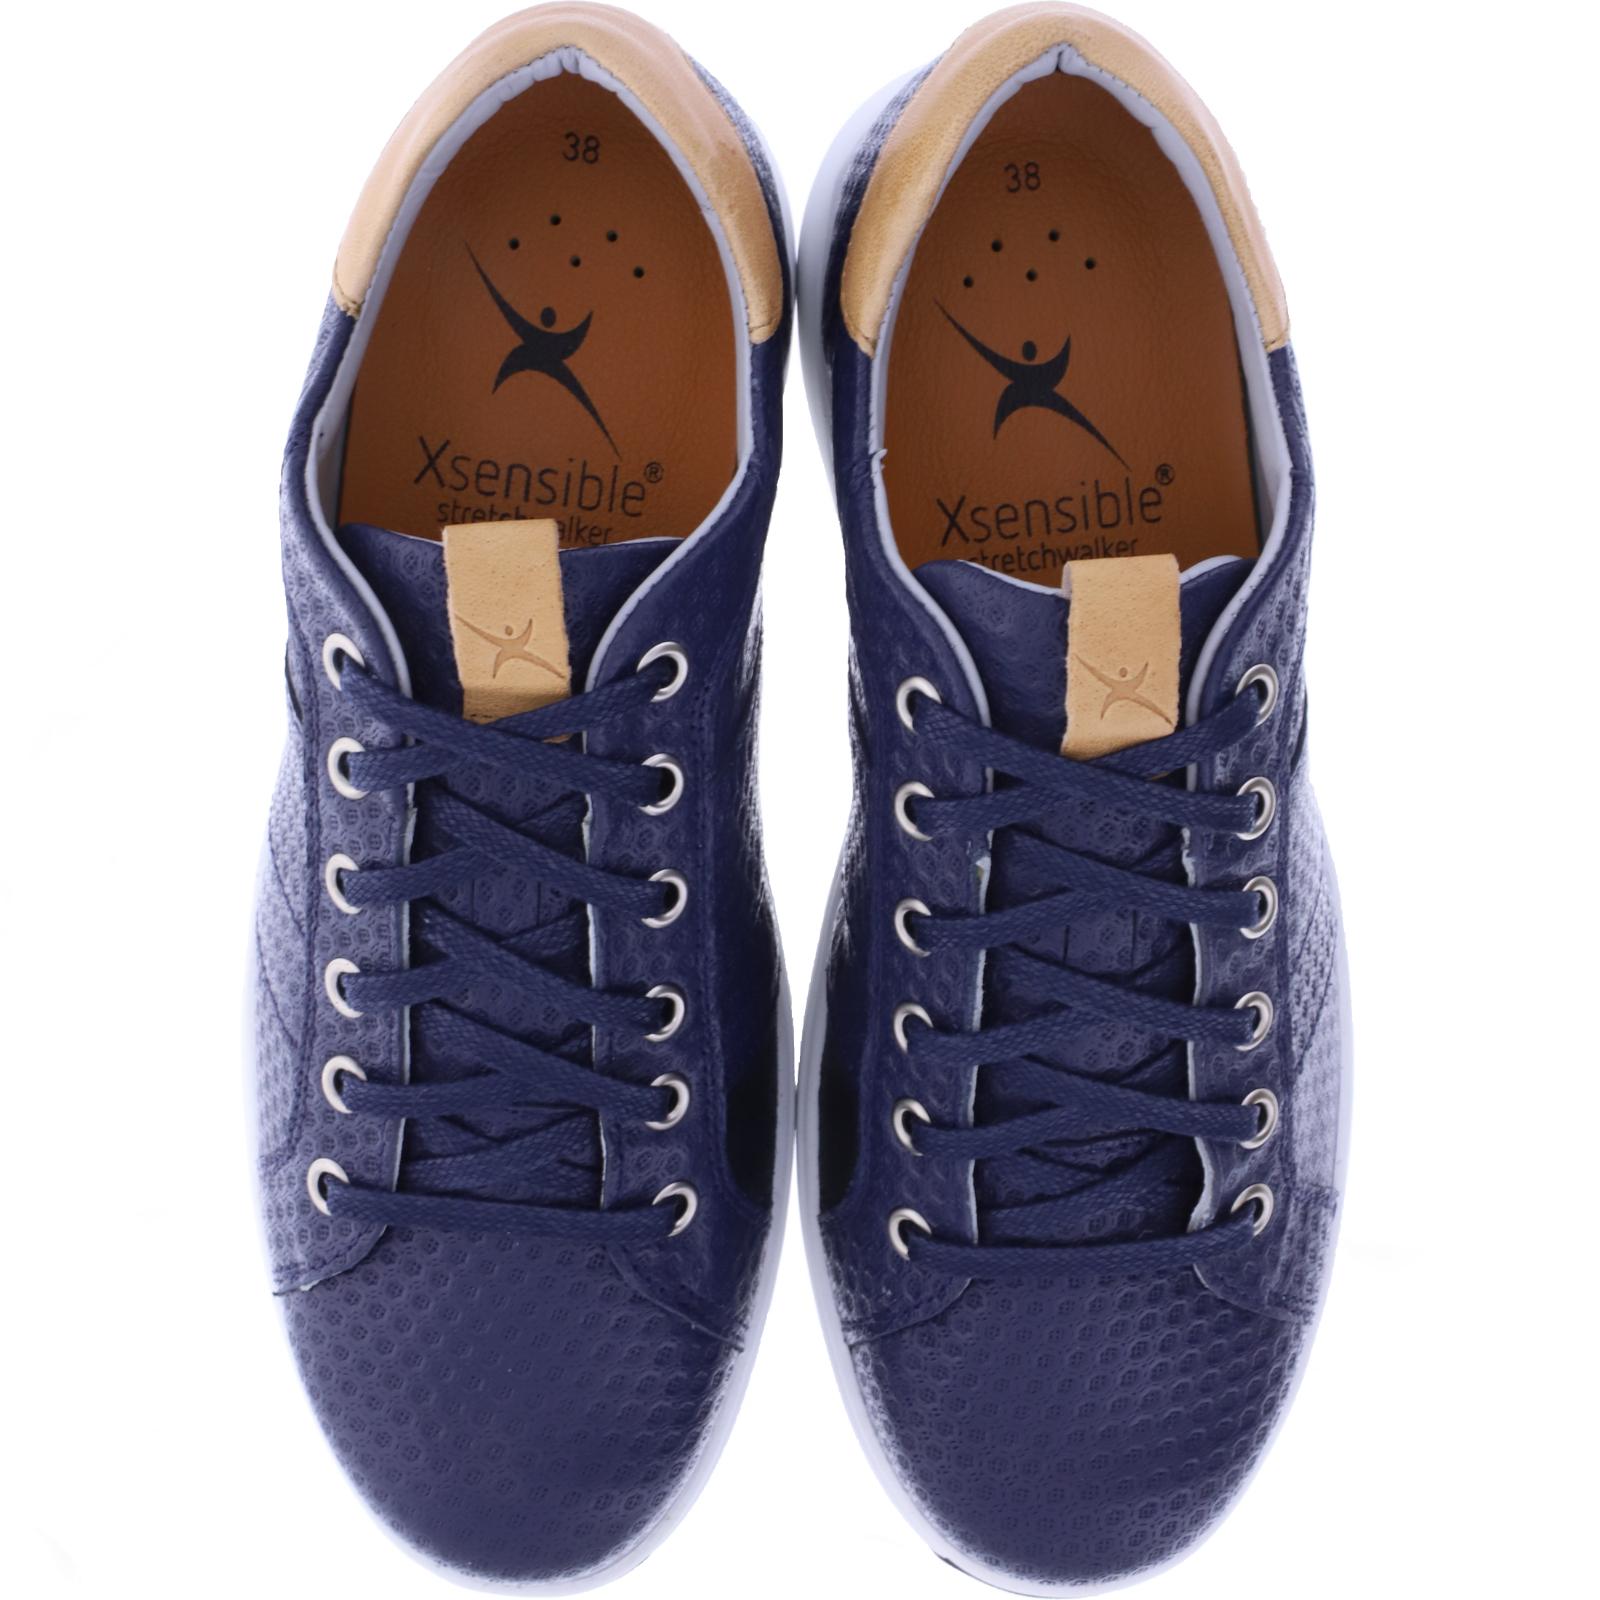 Xsensible Stretchwalker Modell: Toulouse Navy Dunkelblau Art: 302052 220 Damen Sneakers